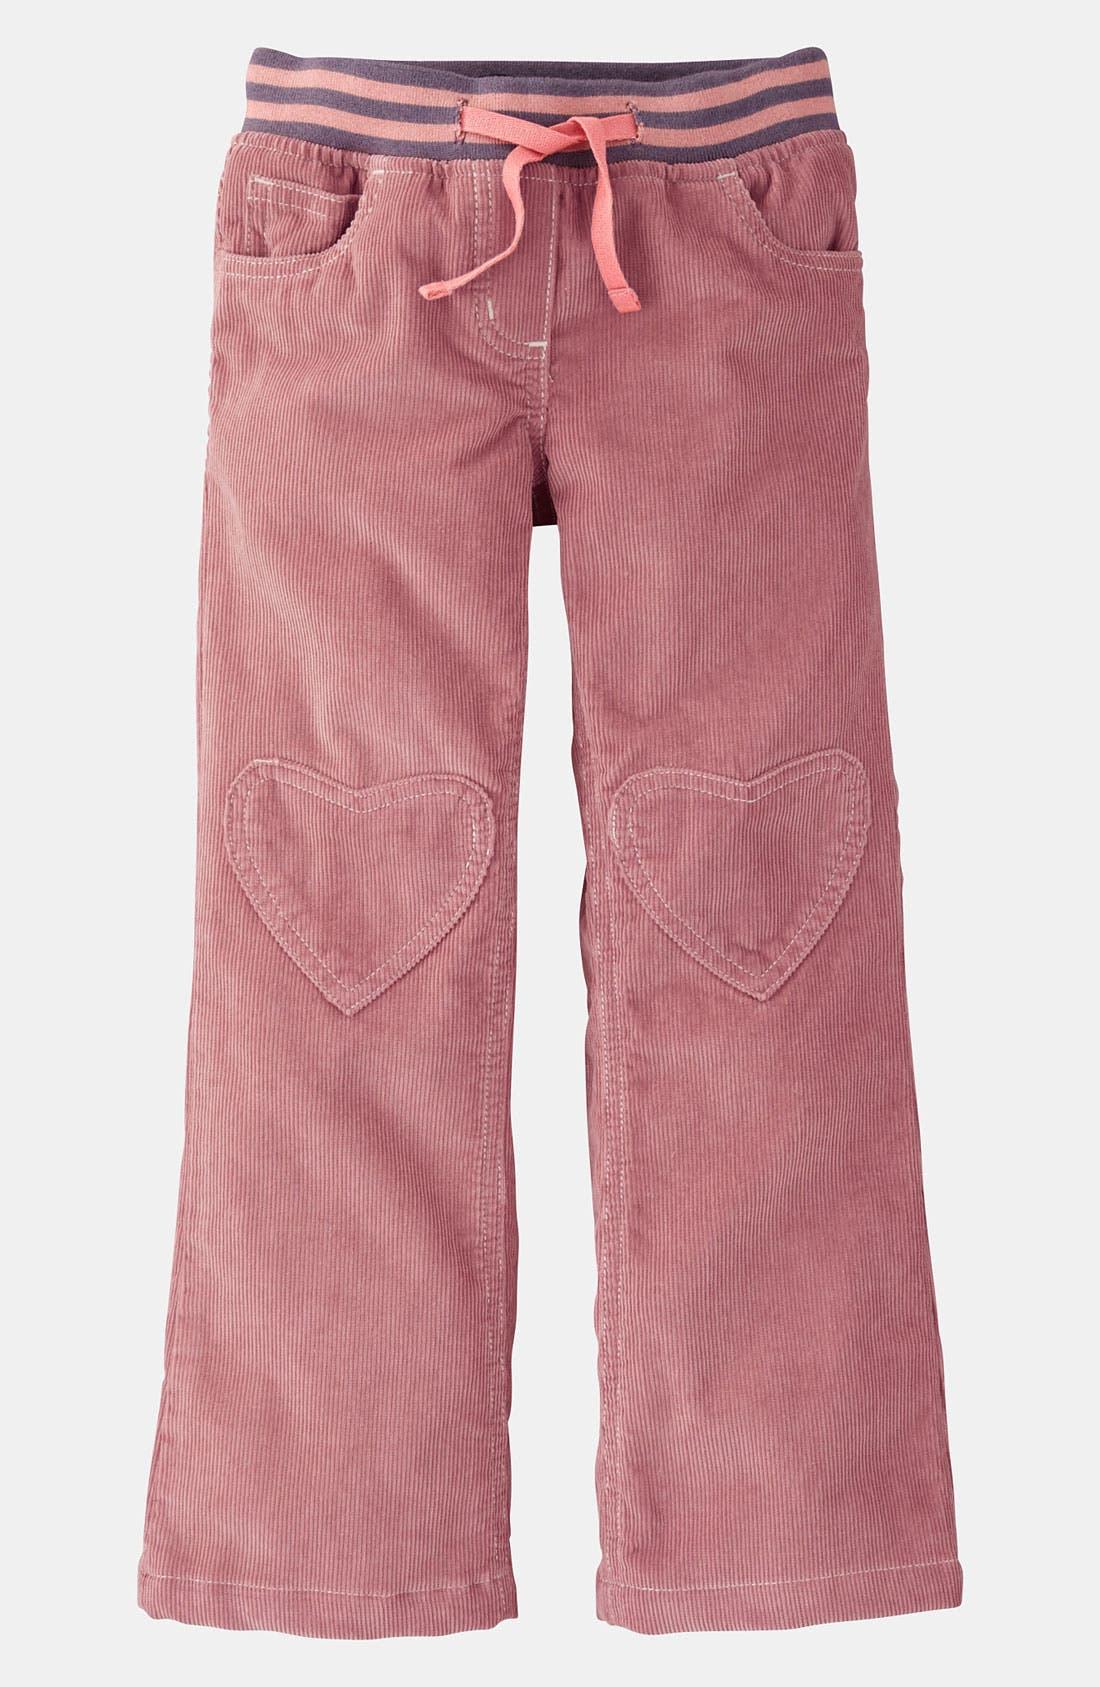 Alternate Image 1 Selected - Mini Boden Heart Patch Pants (Toddler, Little Girls & Big Girls)